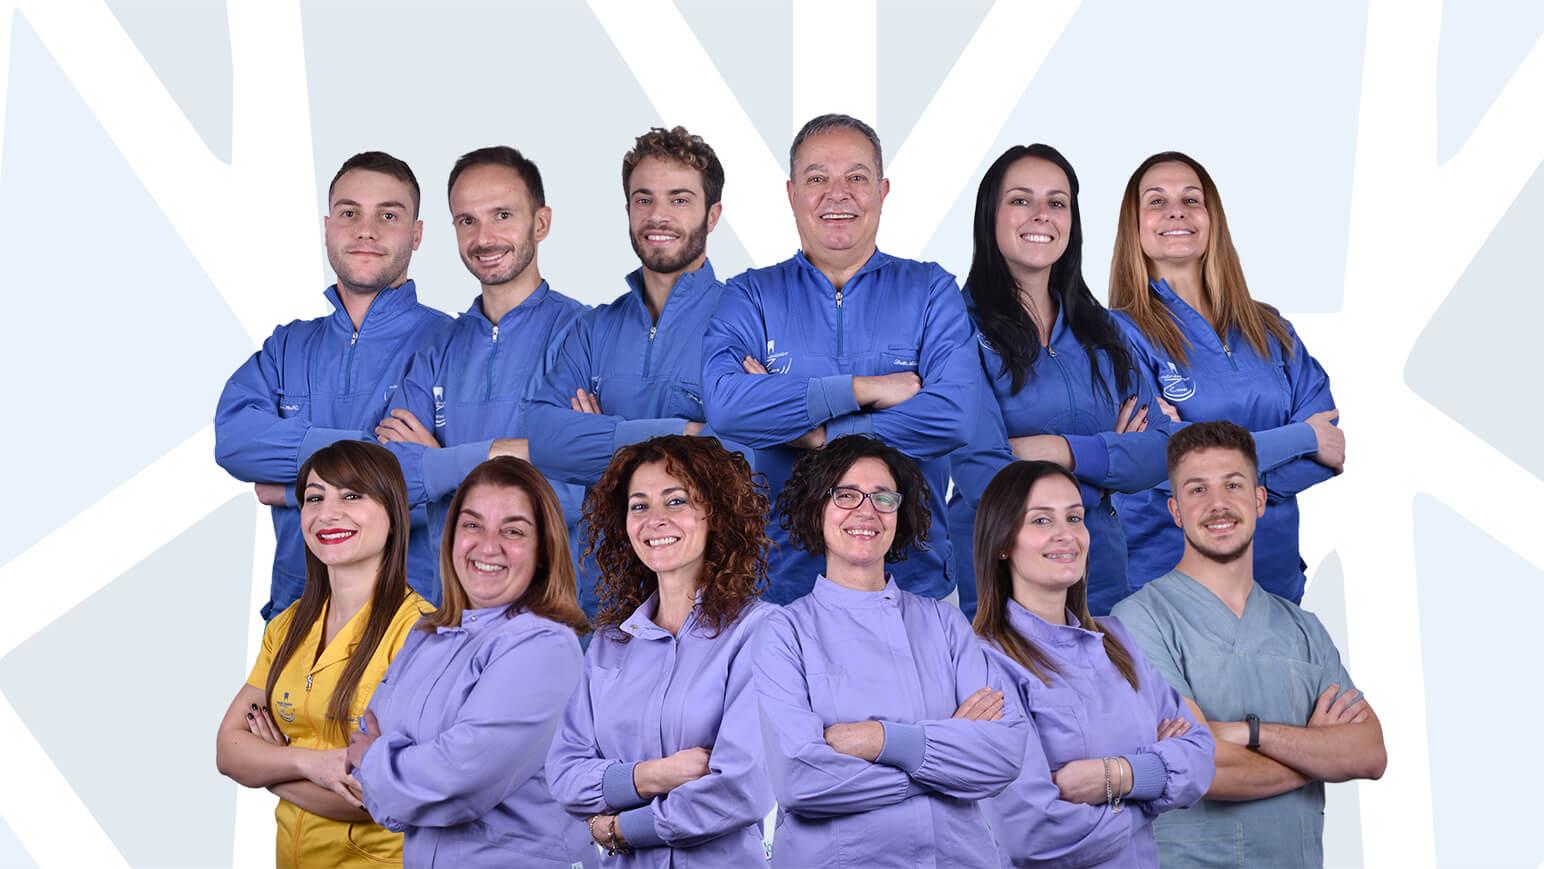 STAFF-Studio-dentistico-Zara